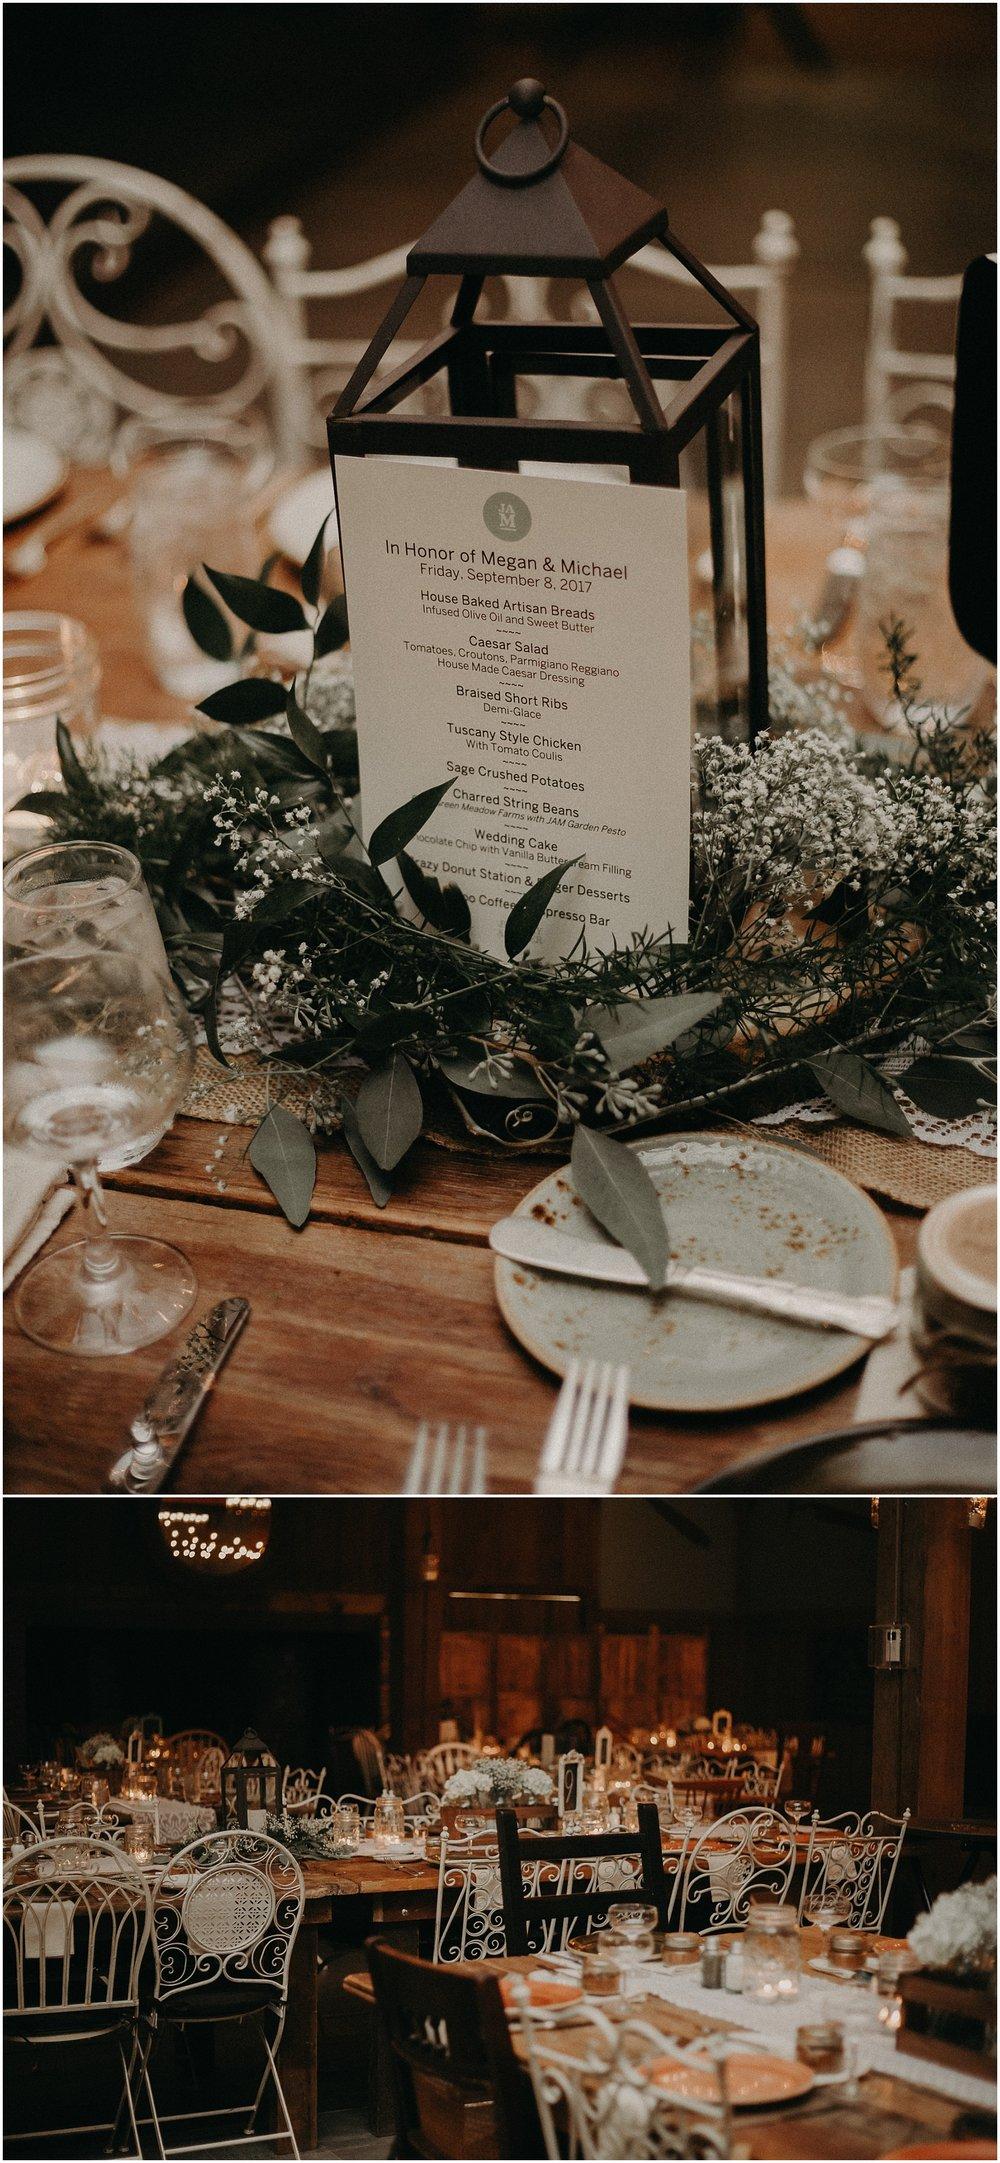 waterloo-village-waterloo village-wedding-outdoor wedding-rustic-boemian-new jersey-bride-groom-wedding party-davids bridal-wedding dress-wedding-first kiss-intimate wedding_0394.jpg